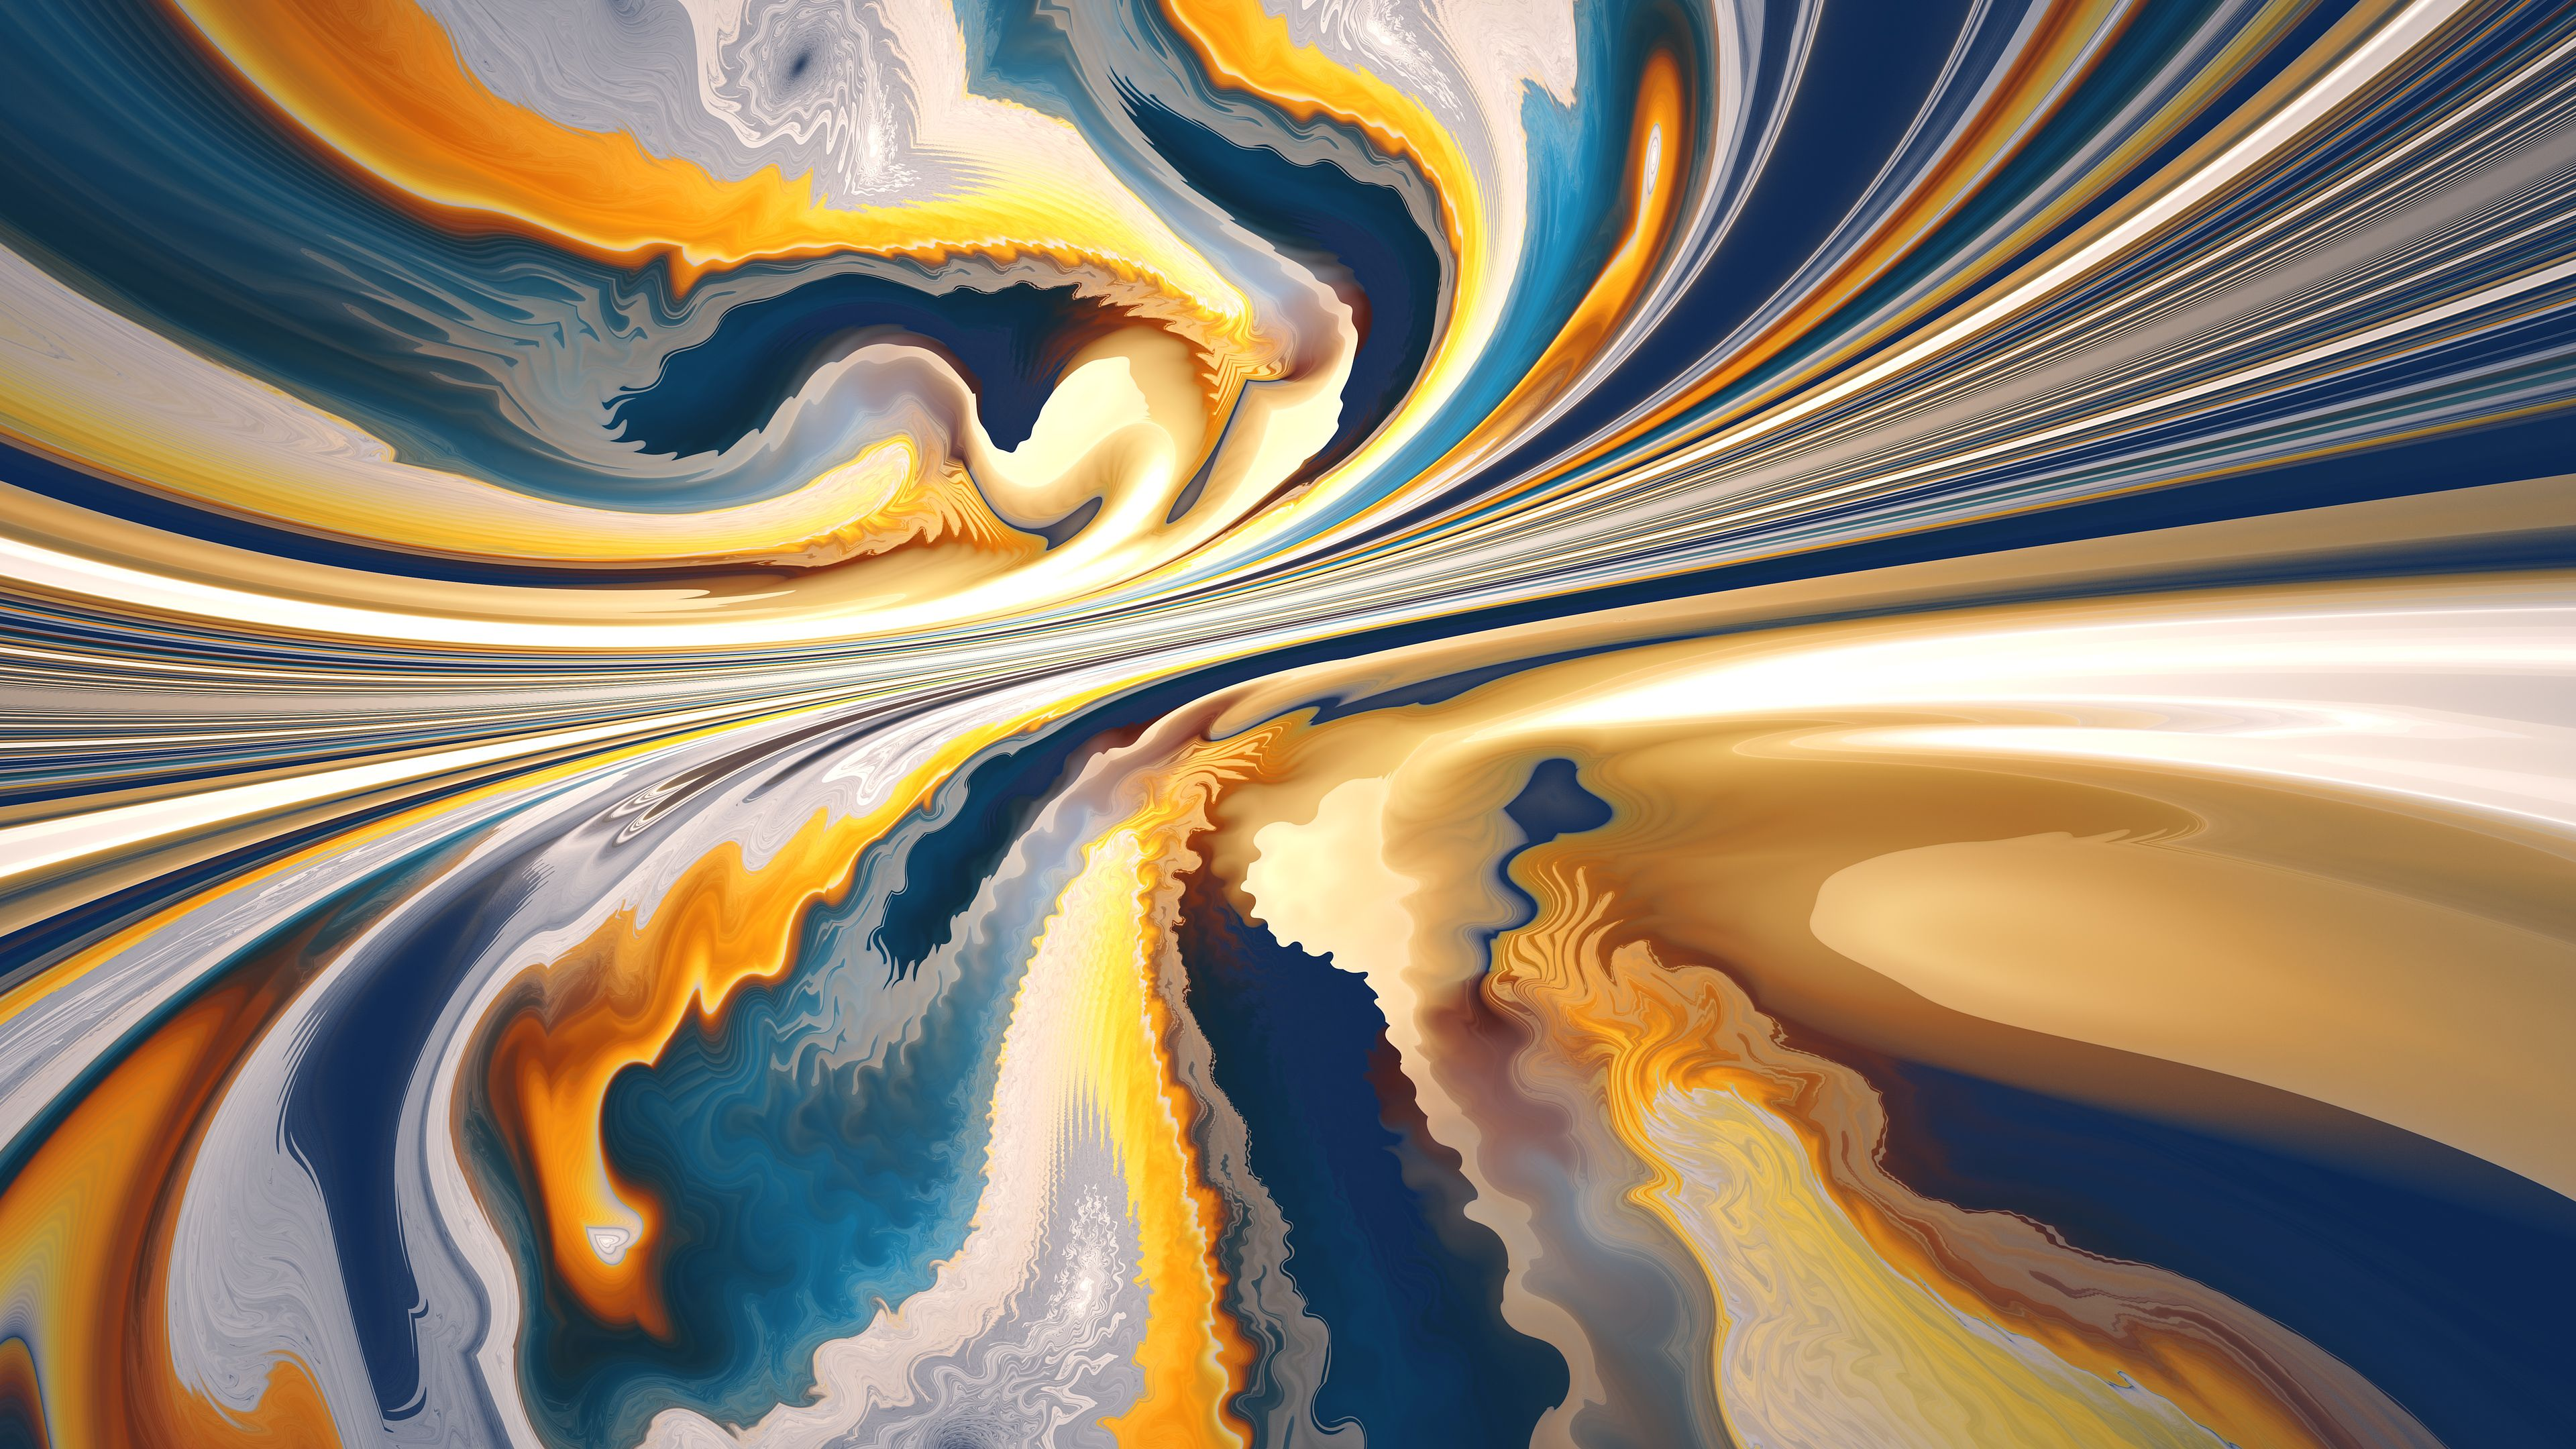 Yellow Heatwaves Hd Wallpapers Digital Art Wallpapers Deviantart Wallpapers Abstract Wallpapers 4k Wallpapers Abstract Wallpaper Art Wallpaper Abstract